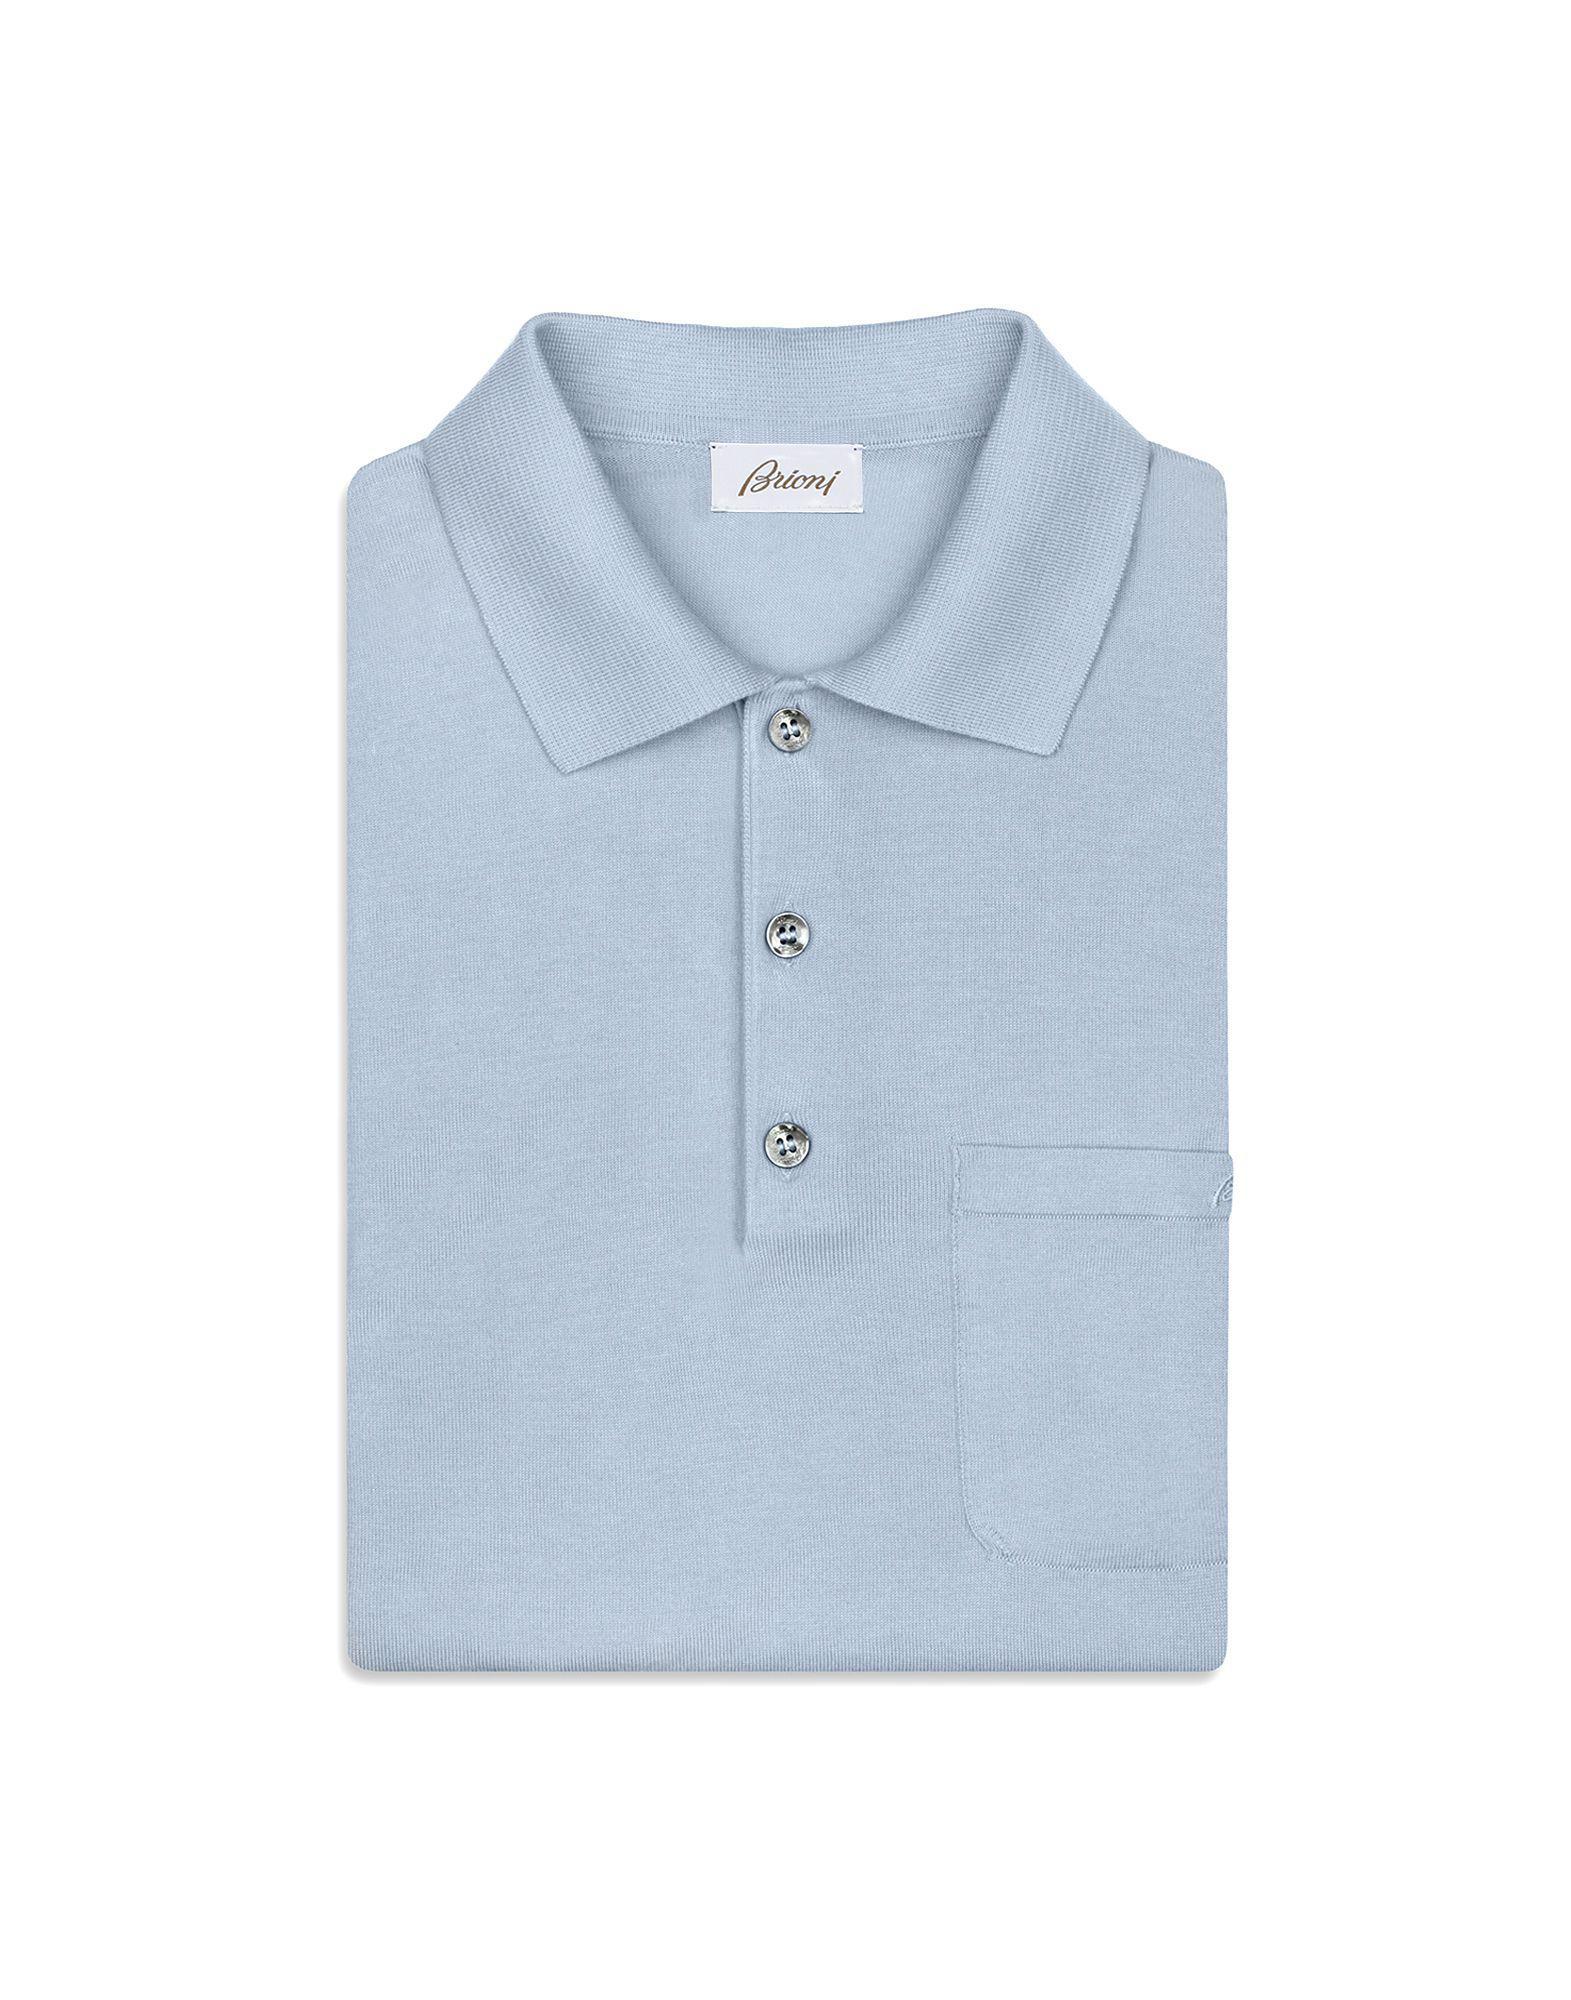 412c586ef Lyst - Brioni Light Blue Polo Shirt in Blue for Men